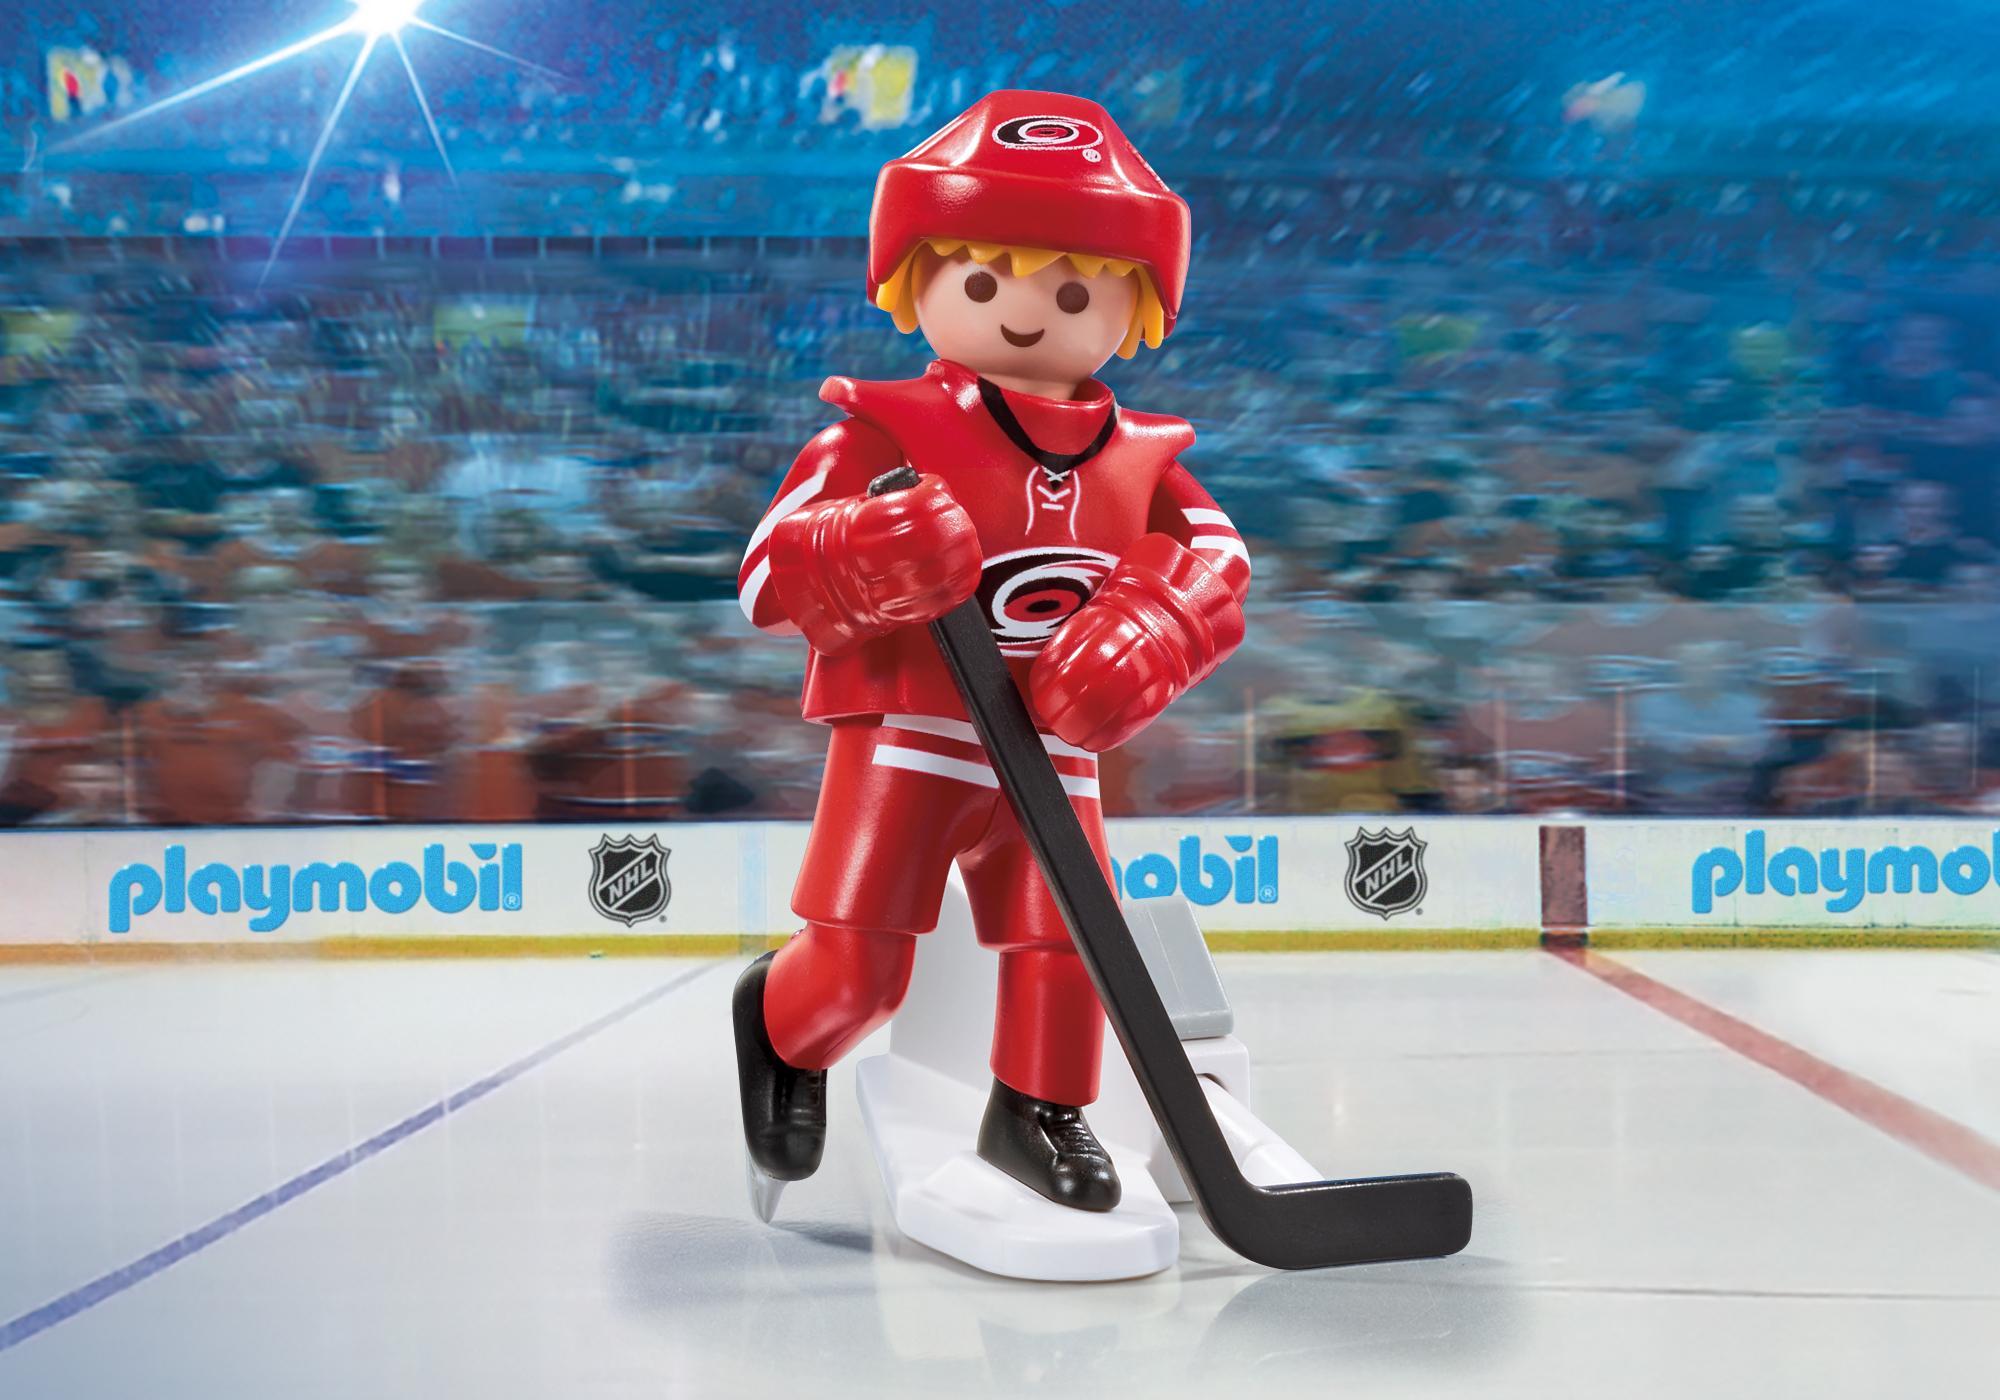 http://media.playmobil.com/i/playmobil/9200_product_detail/NHL® Carolina Hurricanes® Player